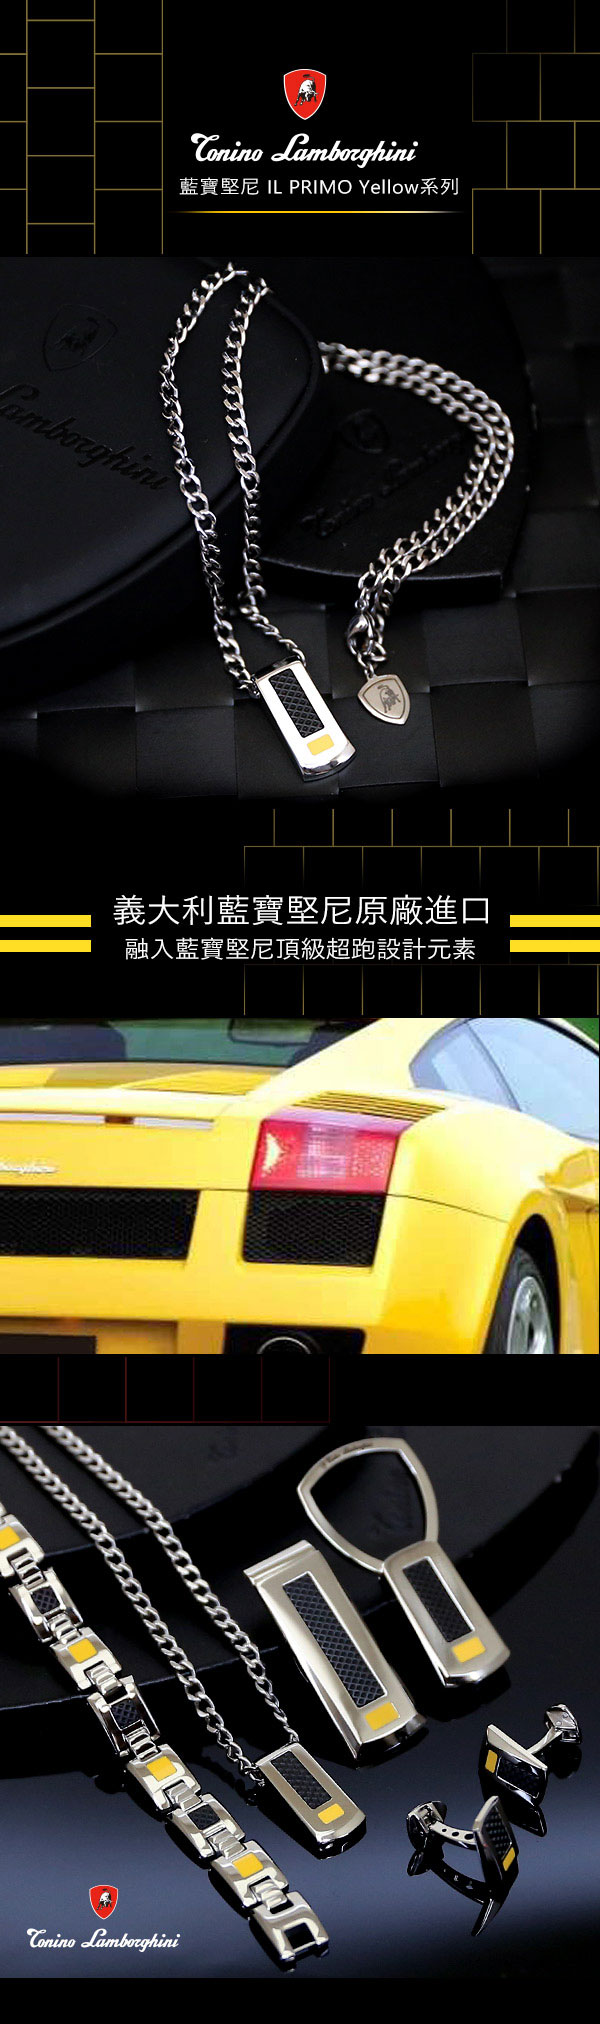 藍寶堅尼Lamborghini |IL PRIMO Yellow |項鍊